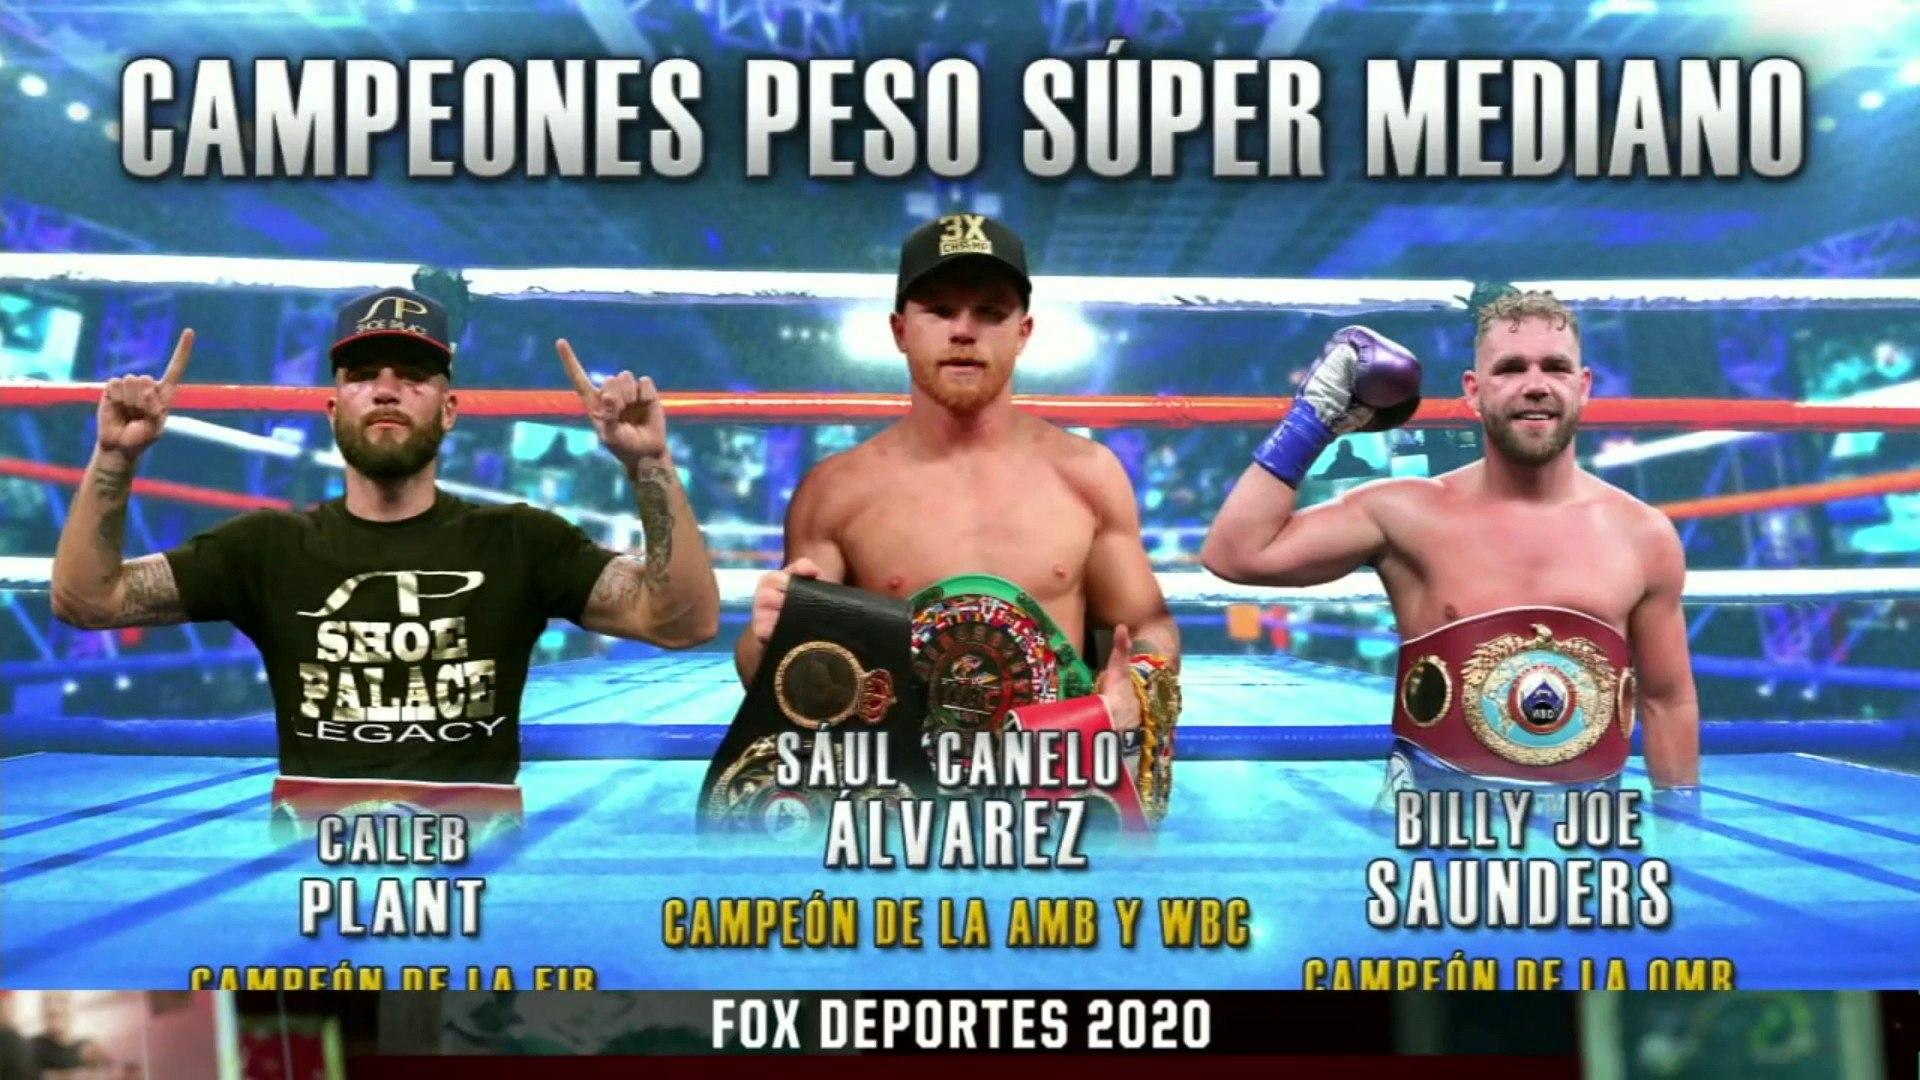 Caleb Plant, Canelo Álvarez & Billy Joe Saunders